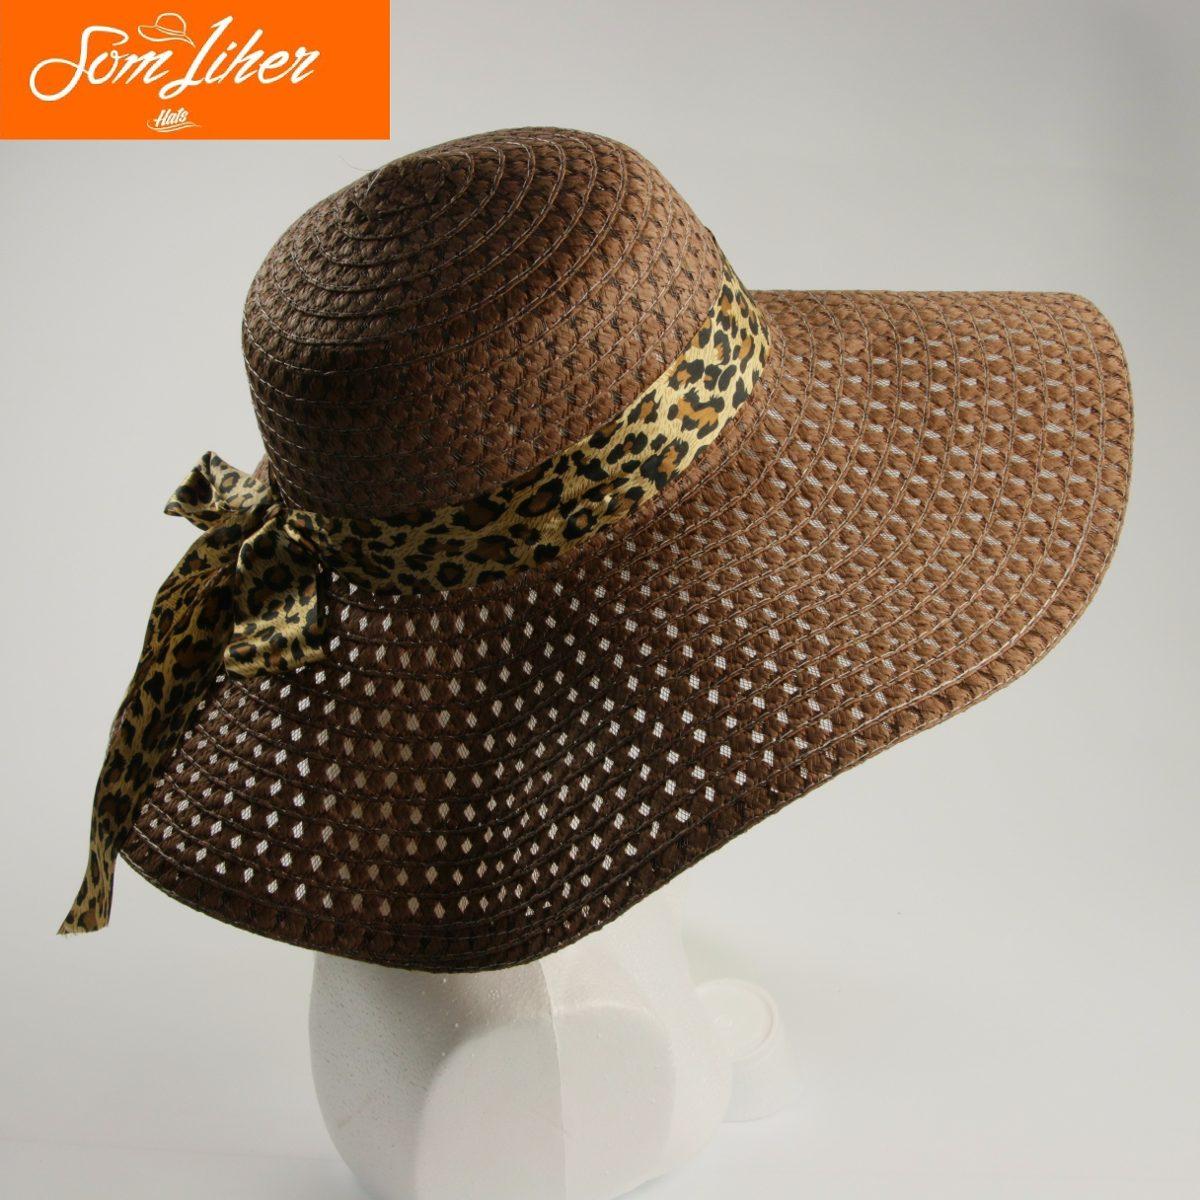 7bb8f0556cf85 Mayoreo sombrero playa dama accesorio moda envío gratis jpg 1200x1200  Sombreros por mayoreo